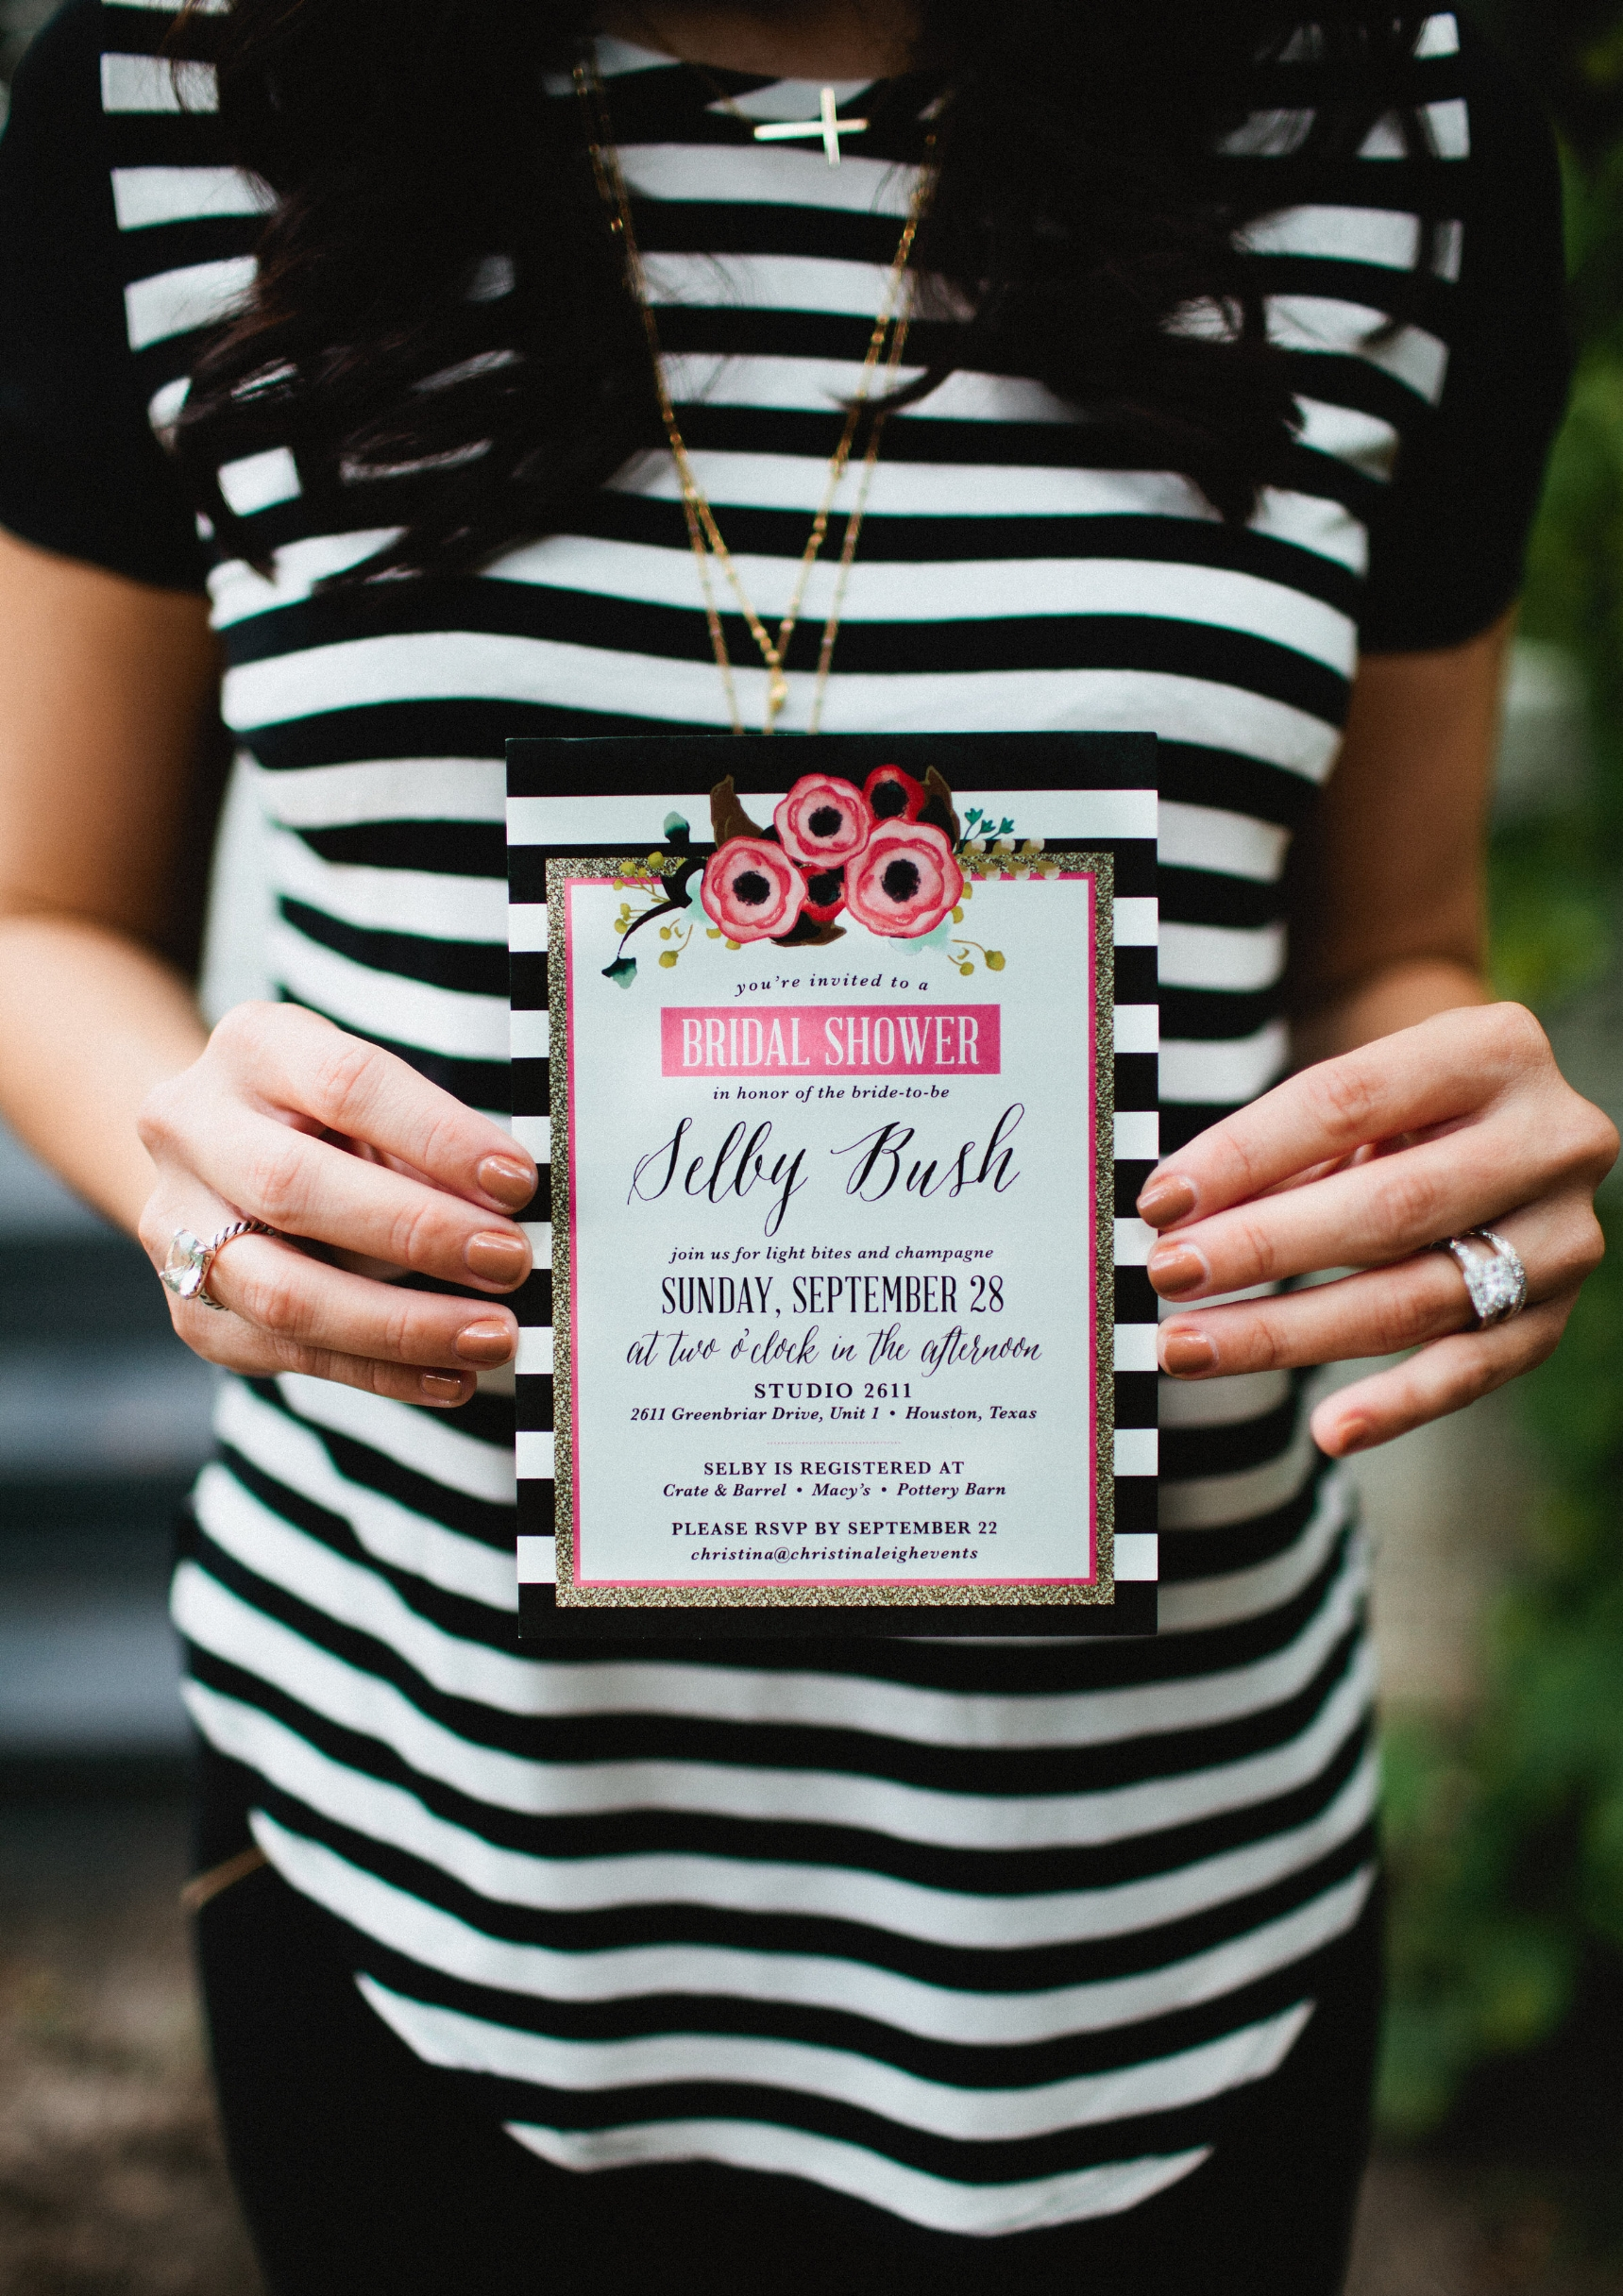 The Helpful Host - Houston Event Planner - Bridal Shower Invitation.jpg